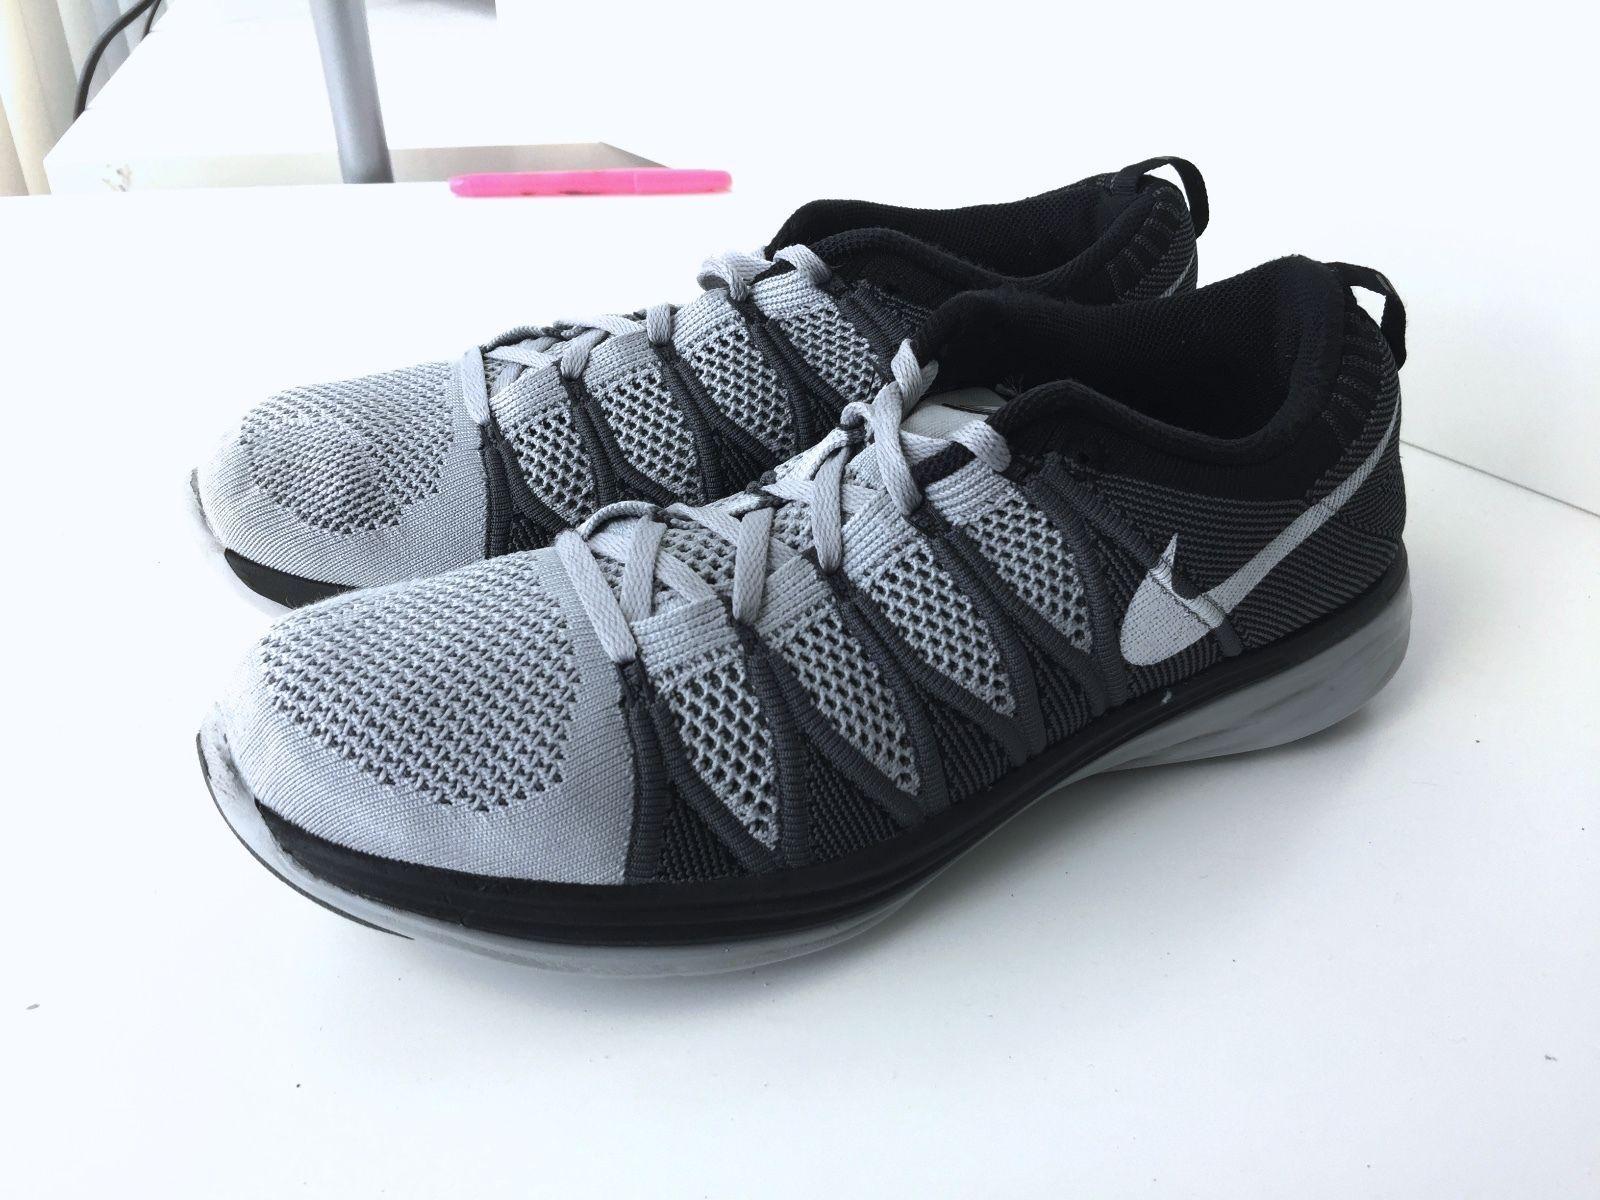 Men's Nike Flyknit Lunar 2 Running Shoes Sz 10.5 M